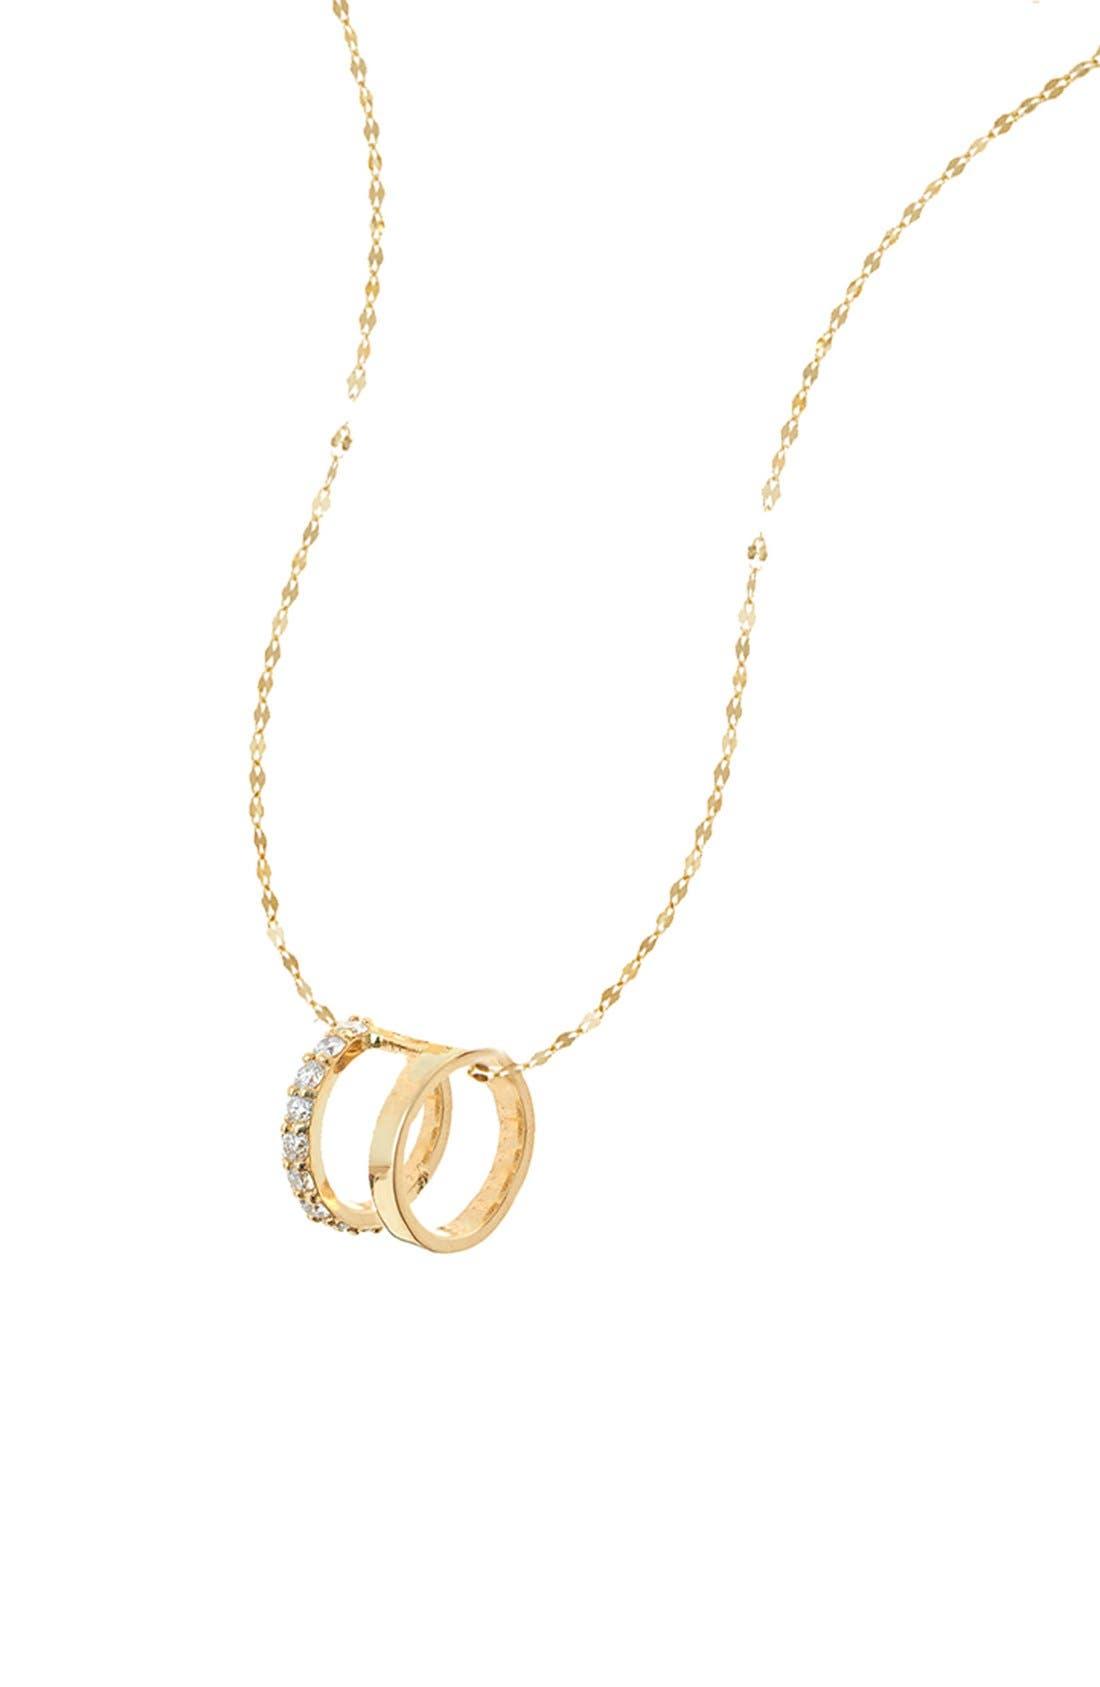 Lana Jewelry 'Flawless Dare' Pendant Necklace